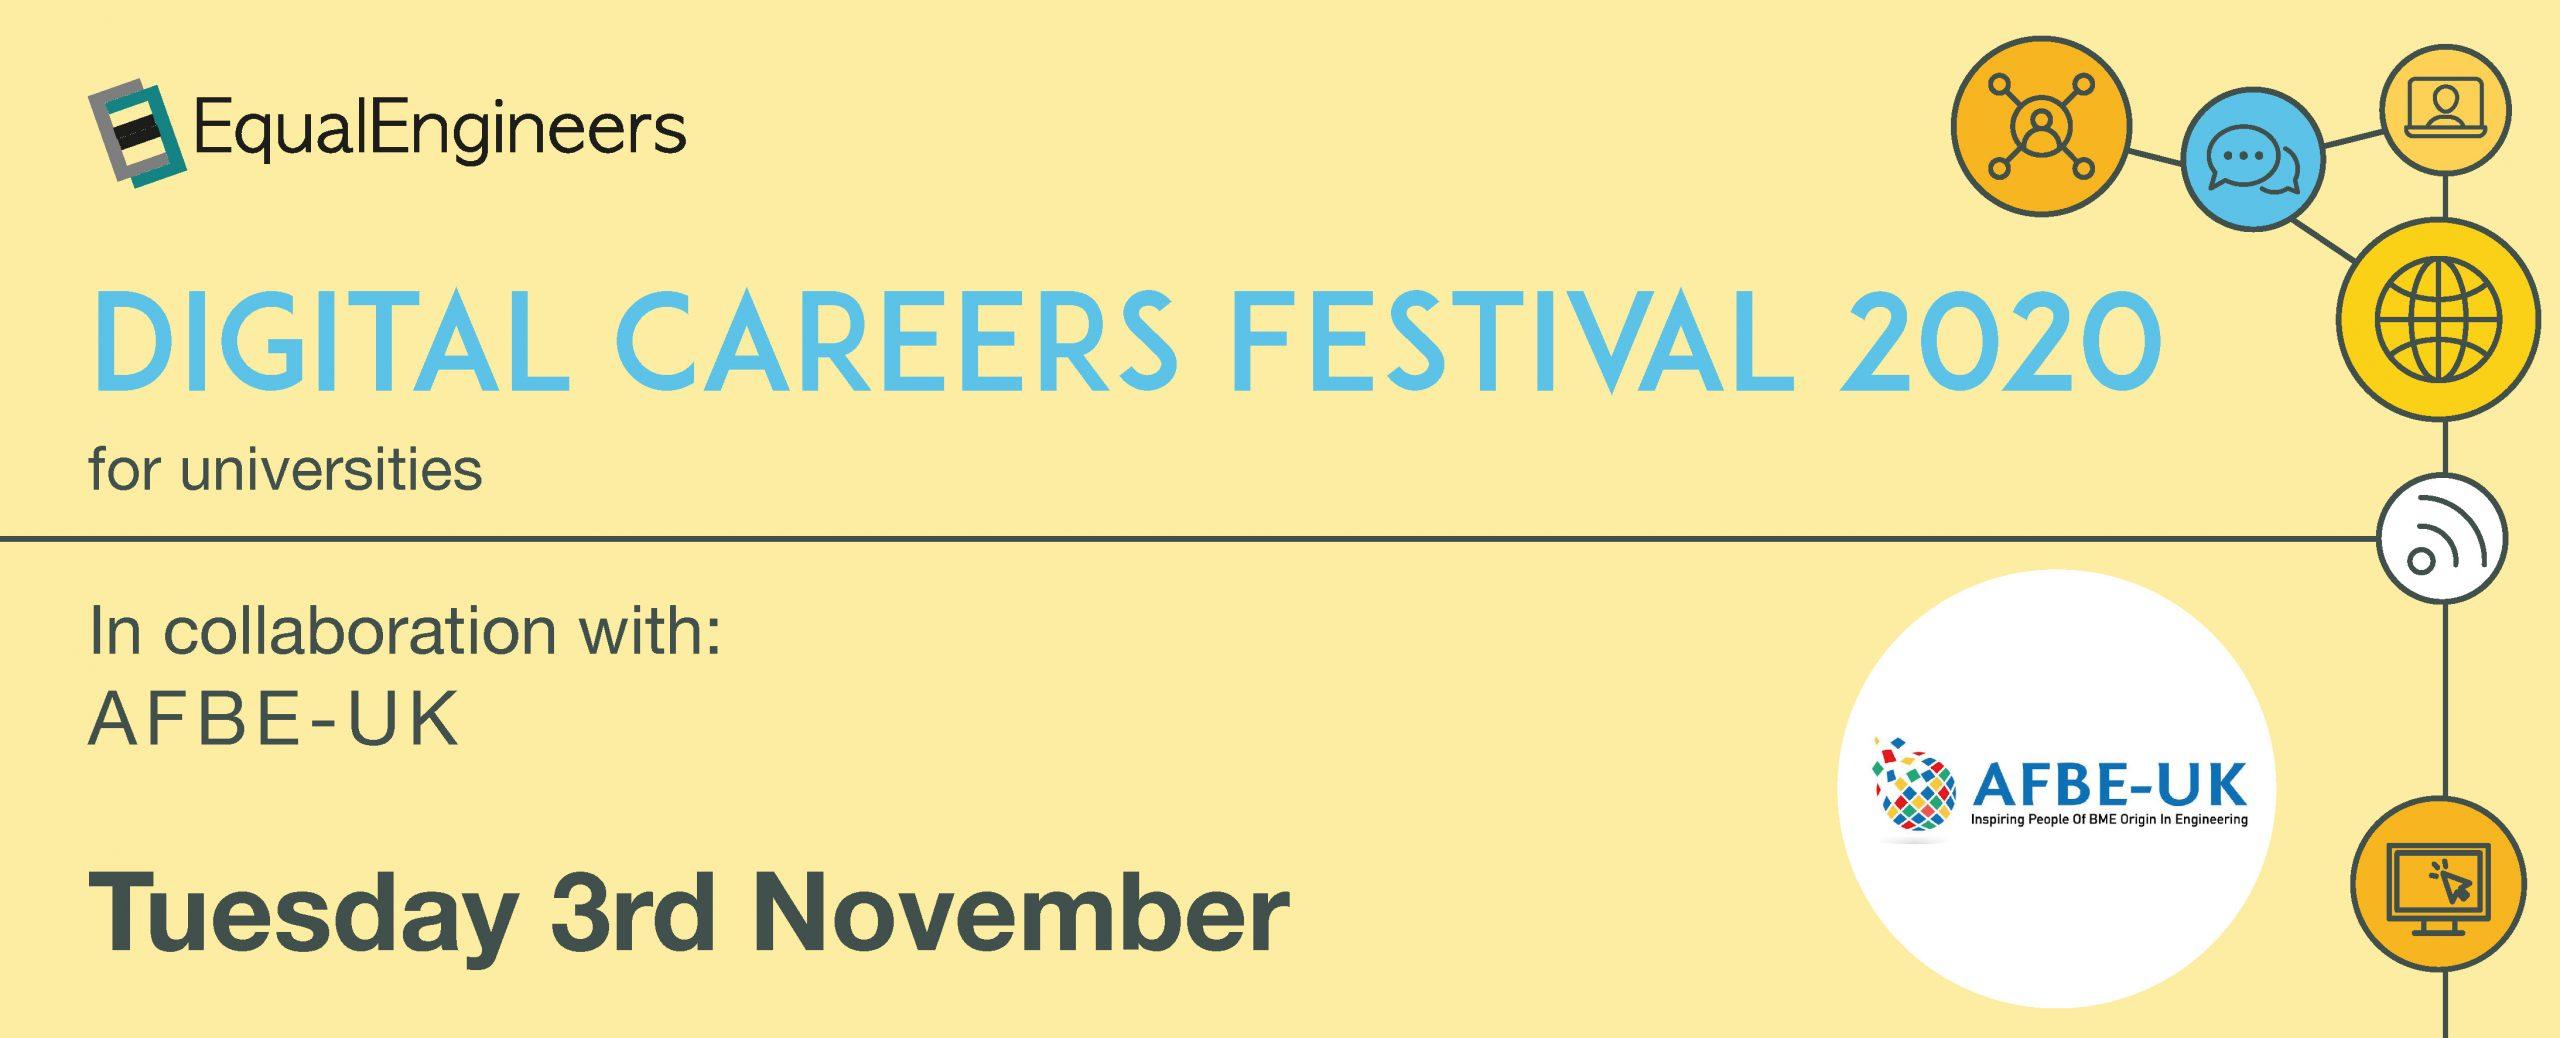 Digital Careers Festival for Universities - 3rd November